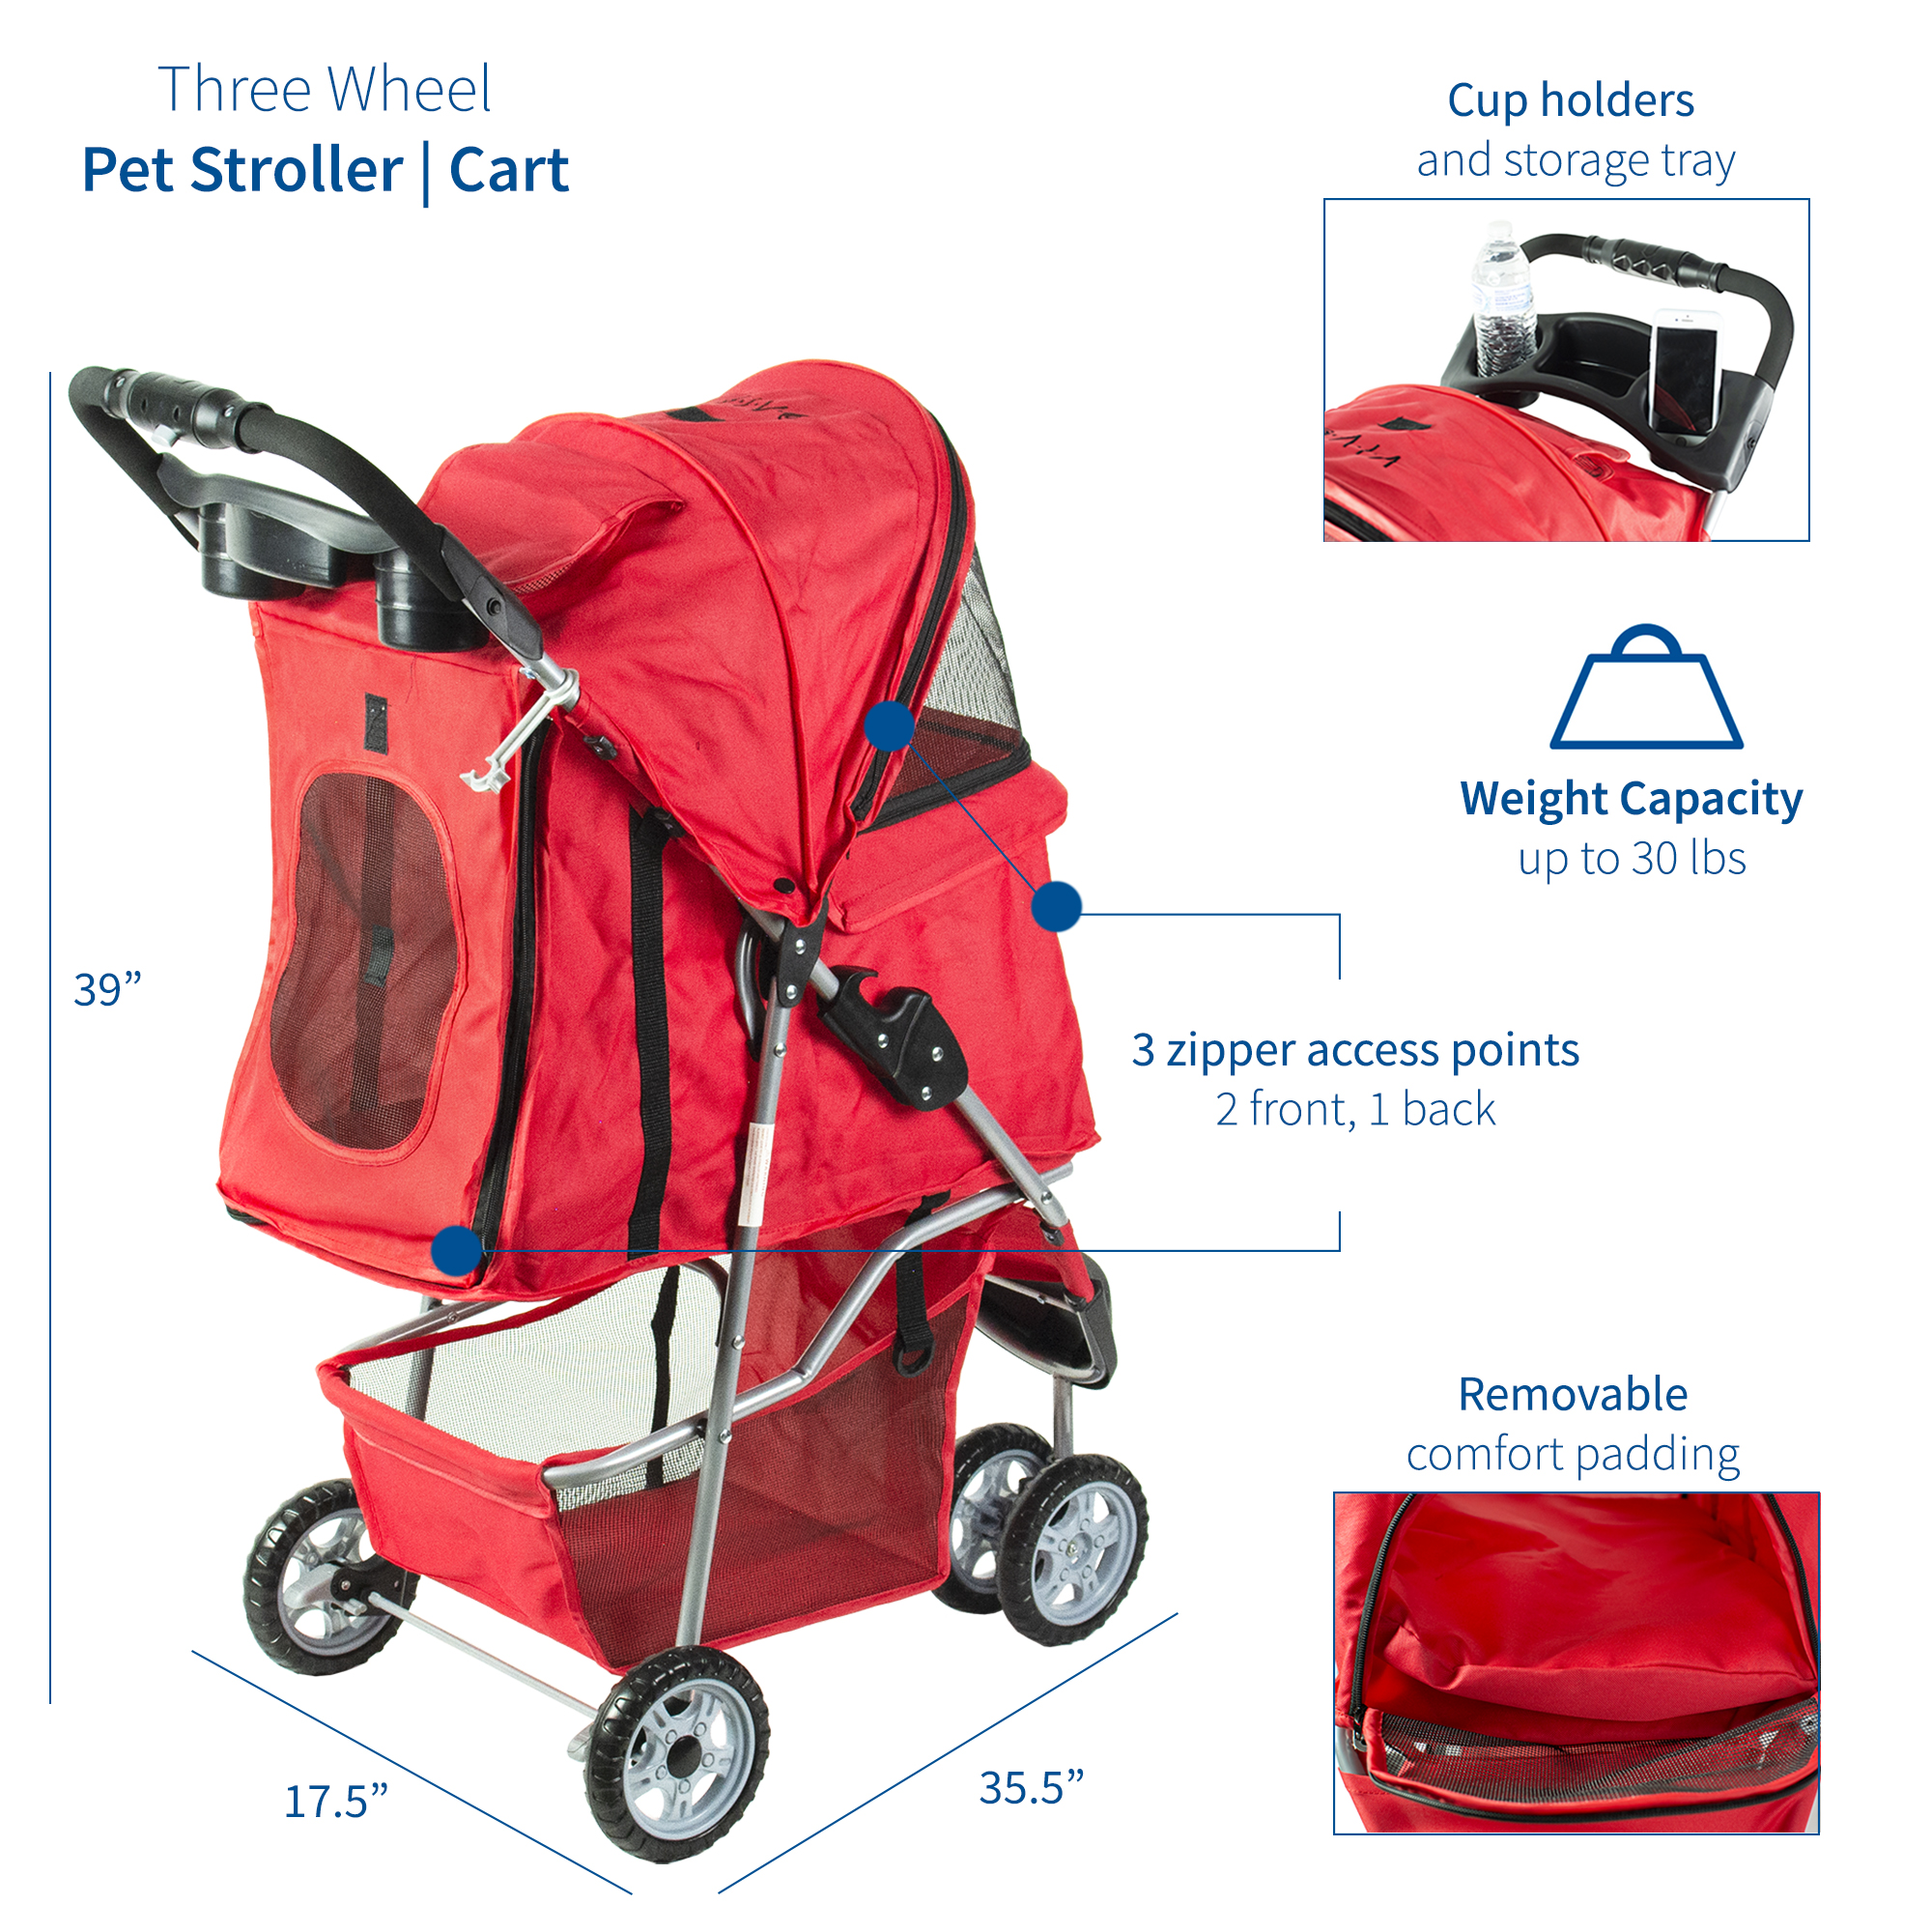 thumbnail 24 - VIVO Three Wheel Pet Stroller / Cat & Dog Foldable Carrier Strolling Cart